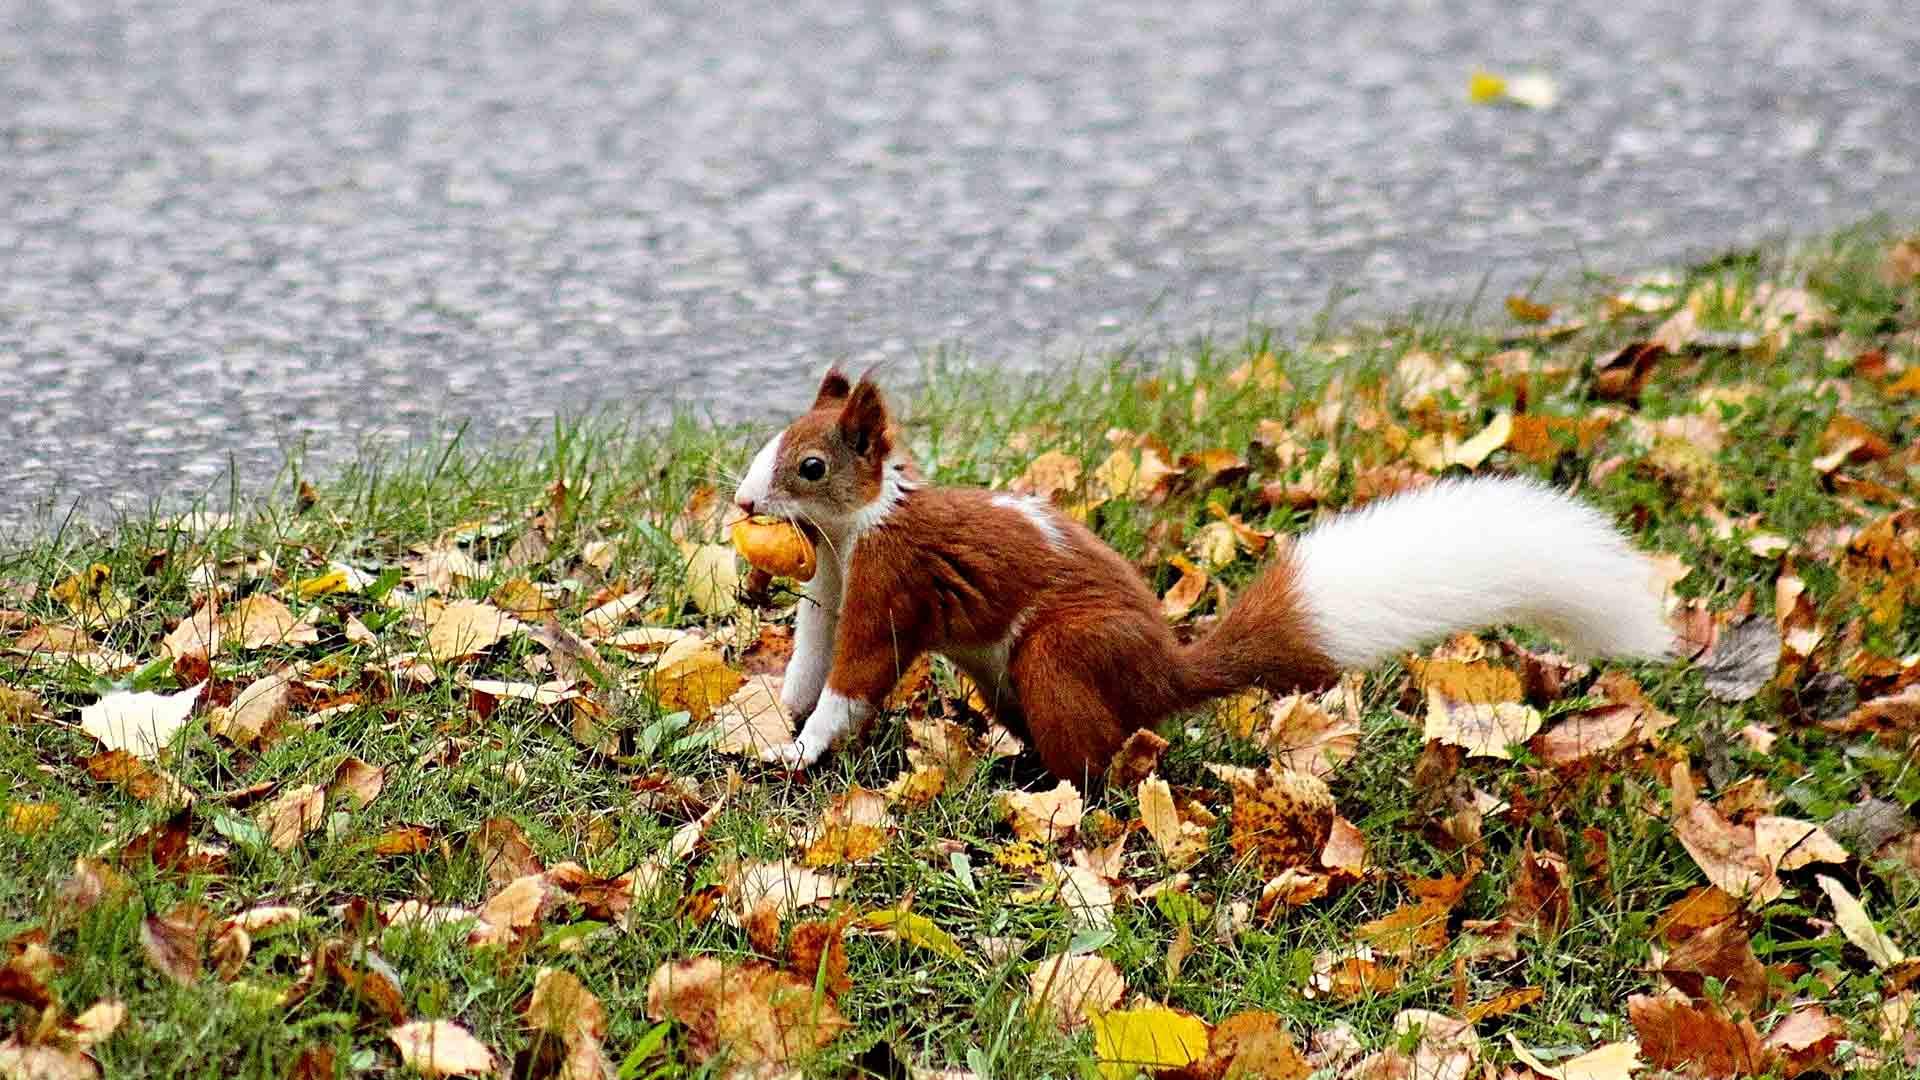 Tornion kirjavat oravat